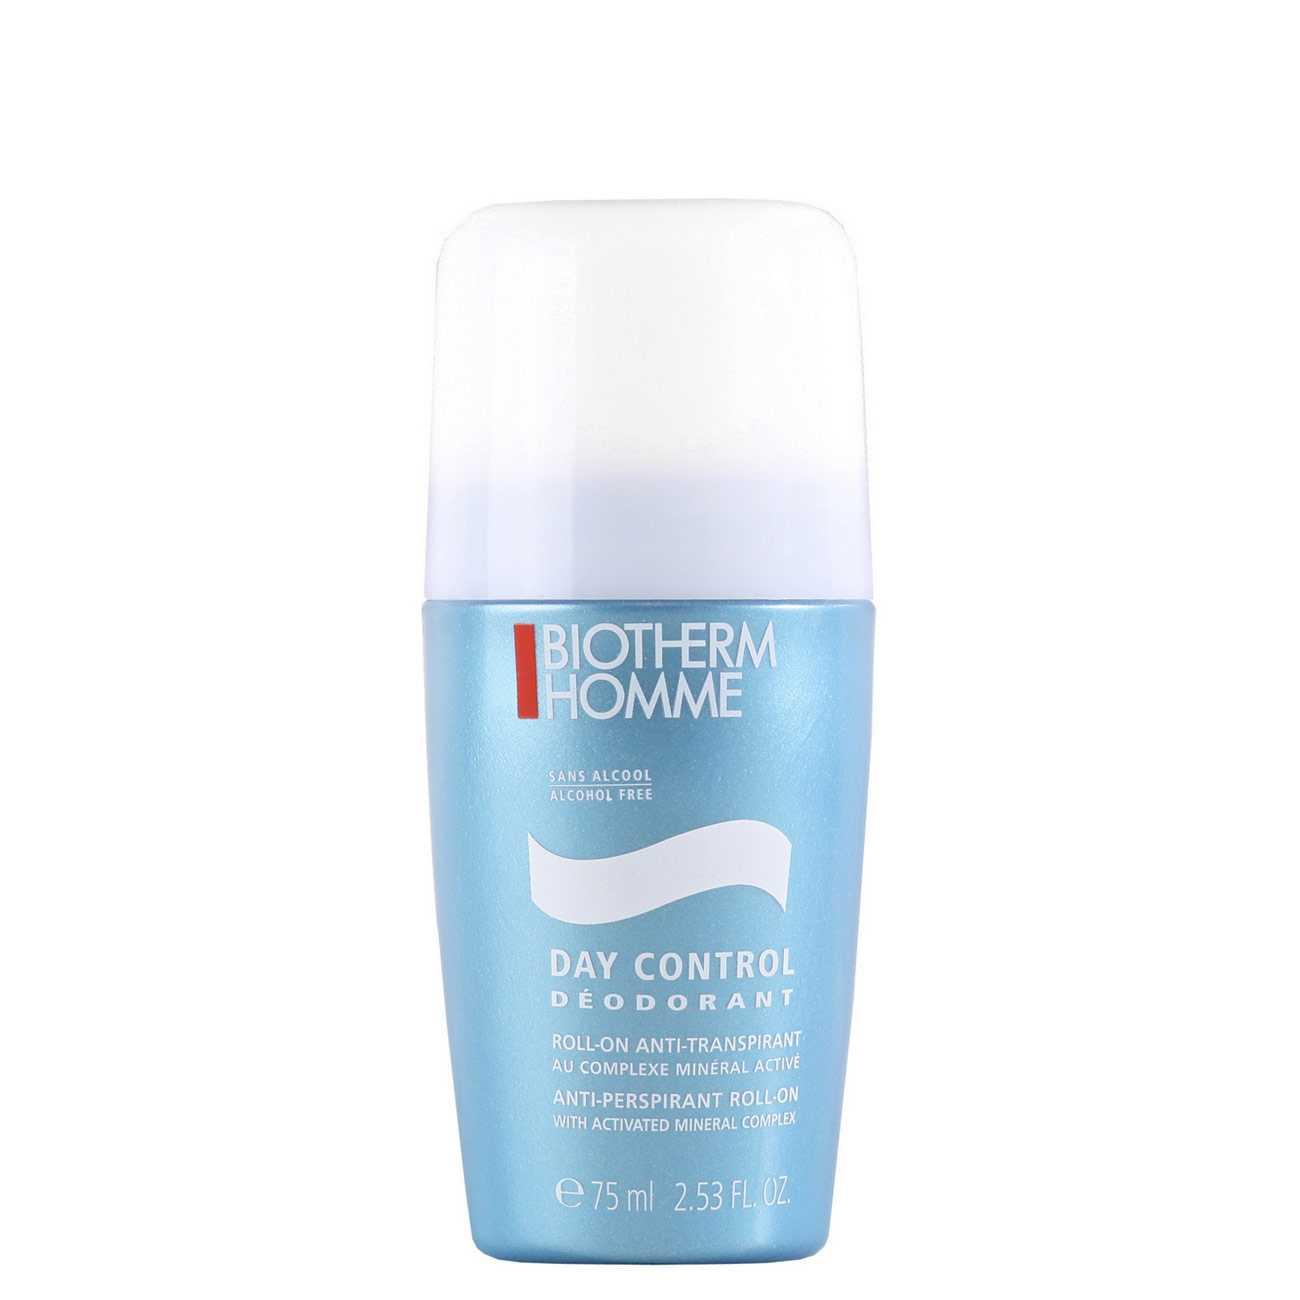 Day Control Deodorant Roll-On 75 Ml Biotherm imagine 2021 bestvalue.eu